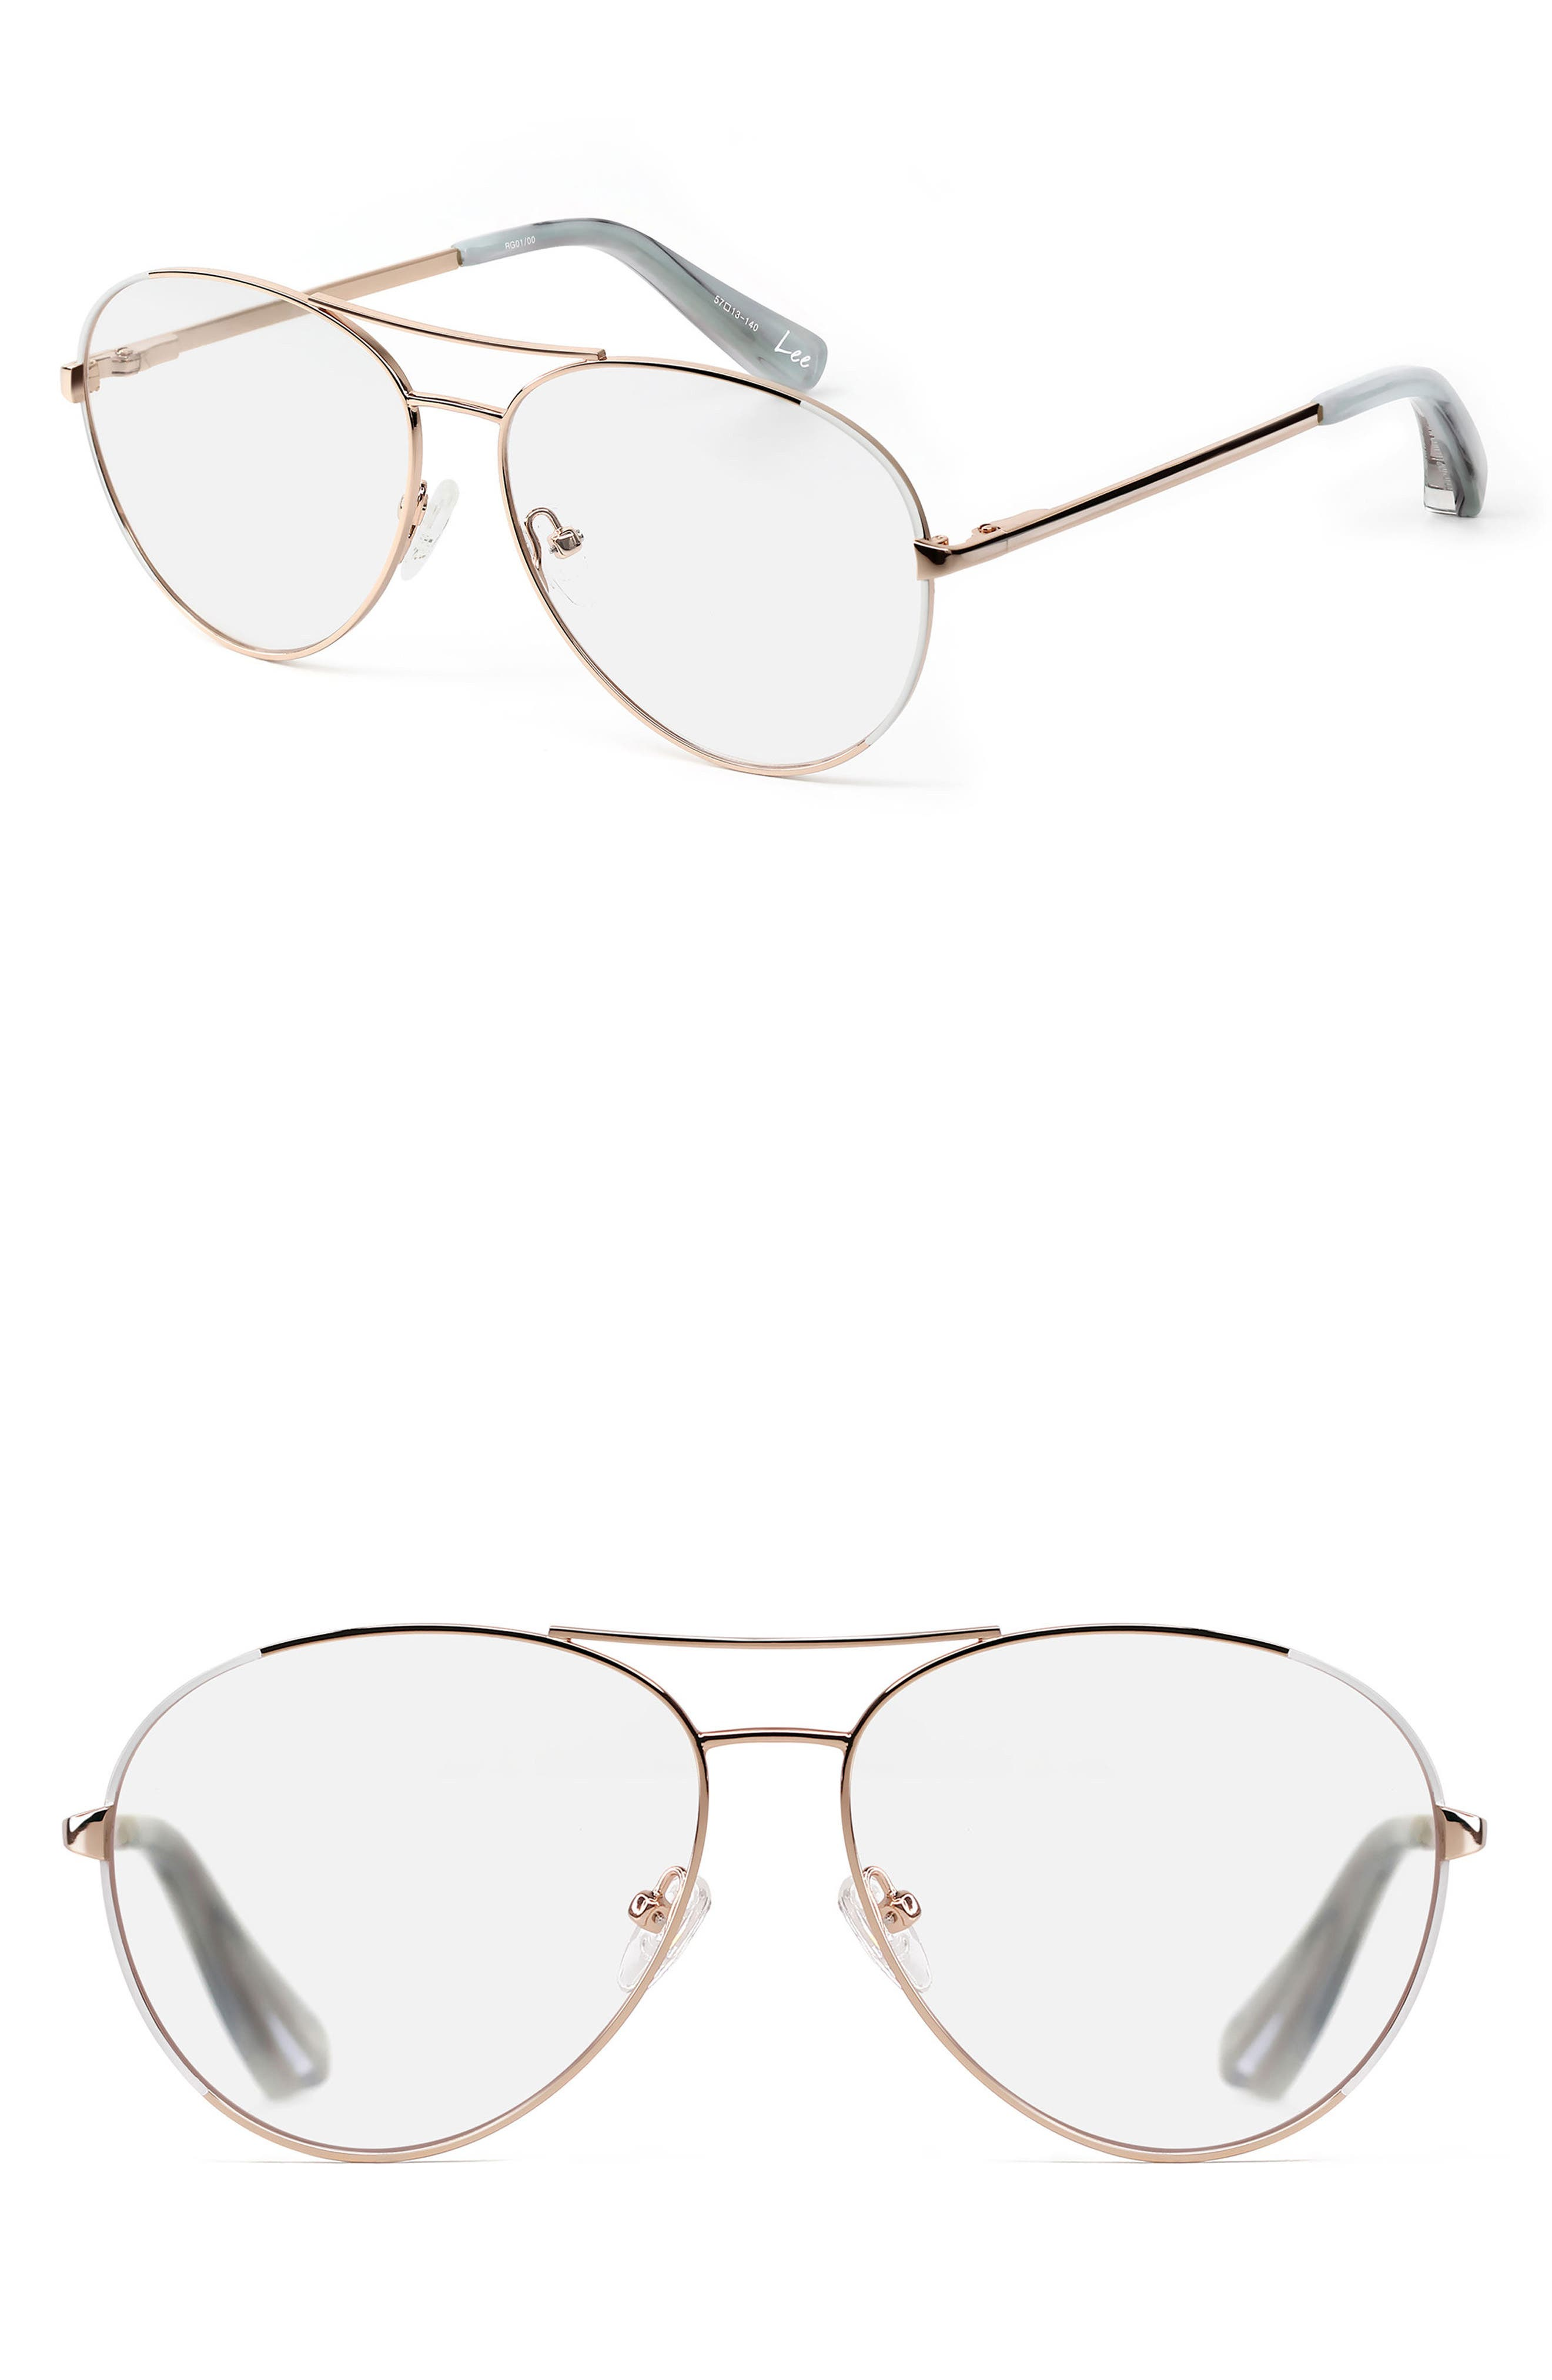 Lee 57mm Aviator Optical Glasses,                             Main thumbnail 1, color,                             Rose Gold